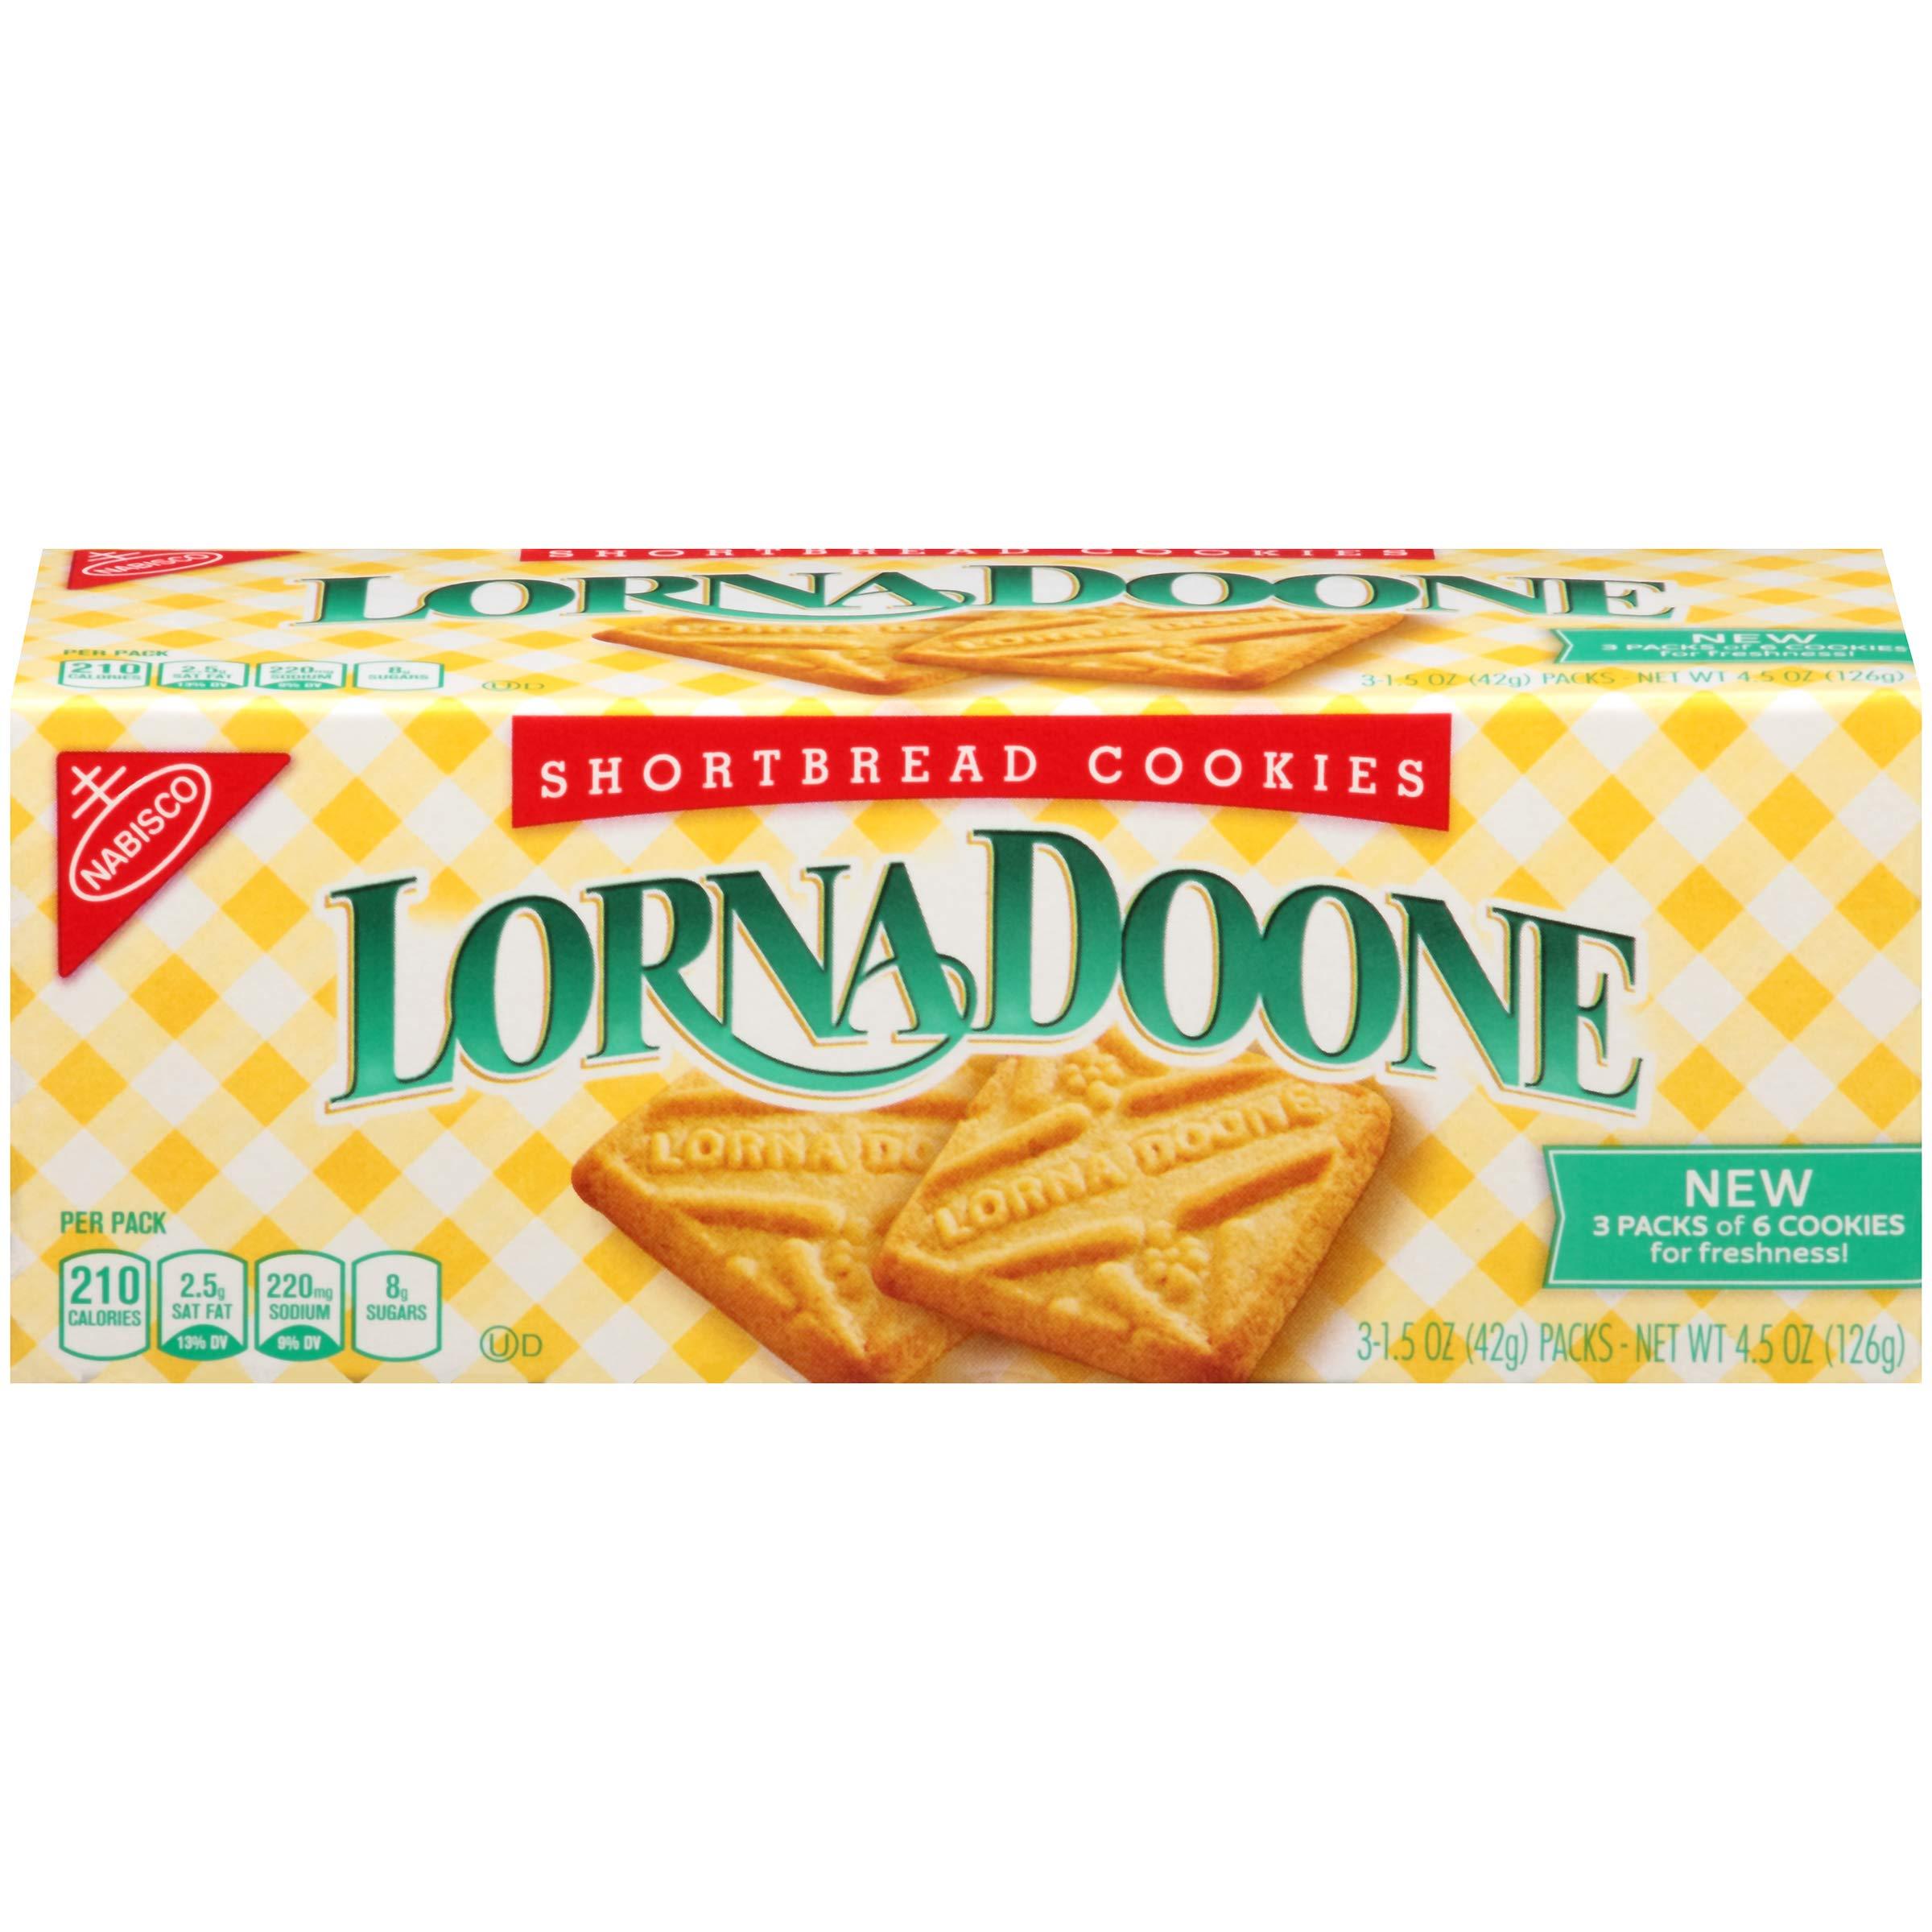 Lorna Doone Shortbread Cookies, 4.5 Ounce (Pack of 12)